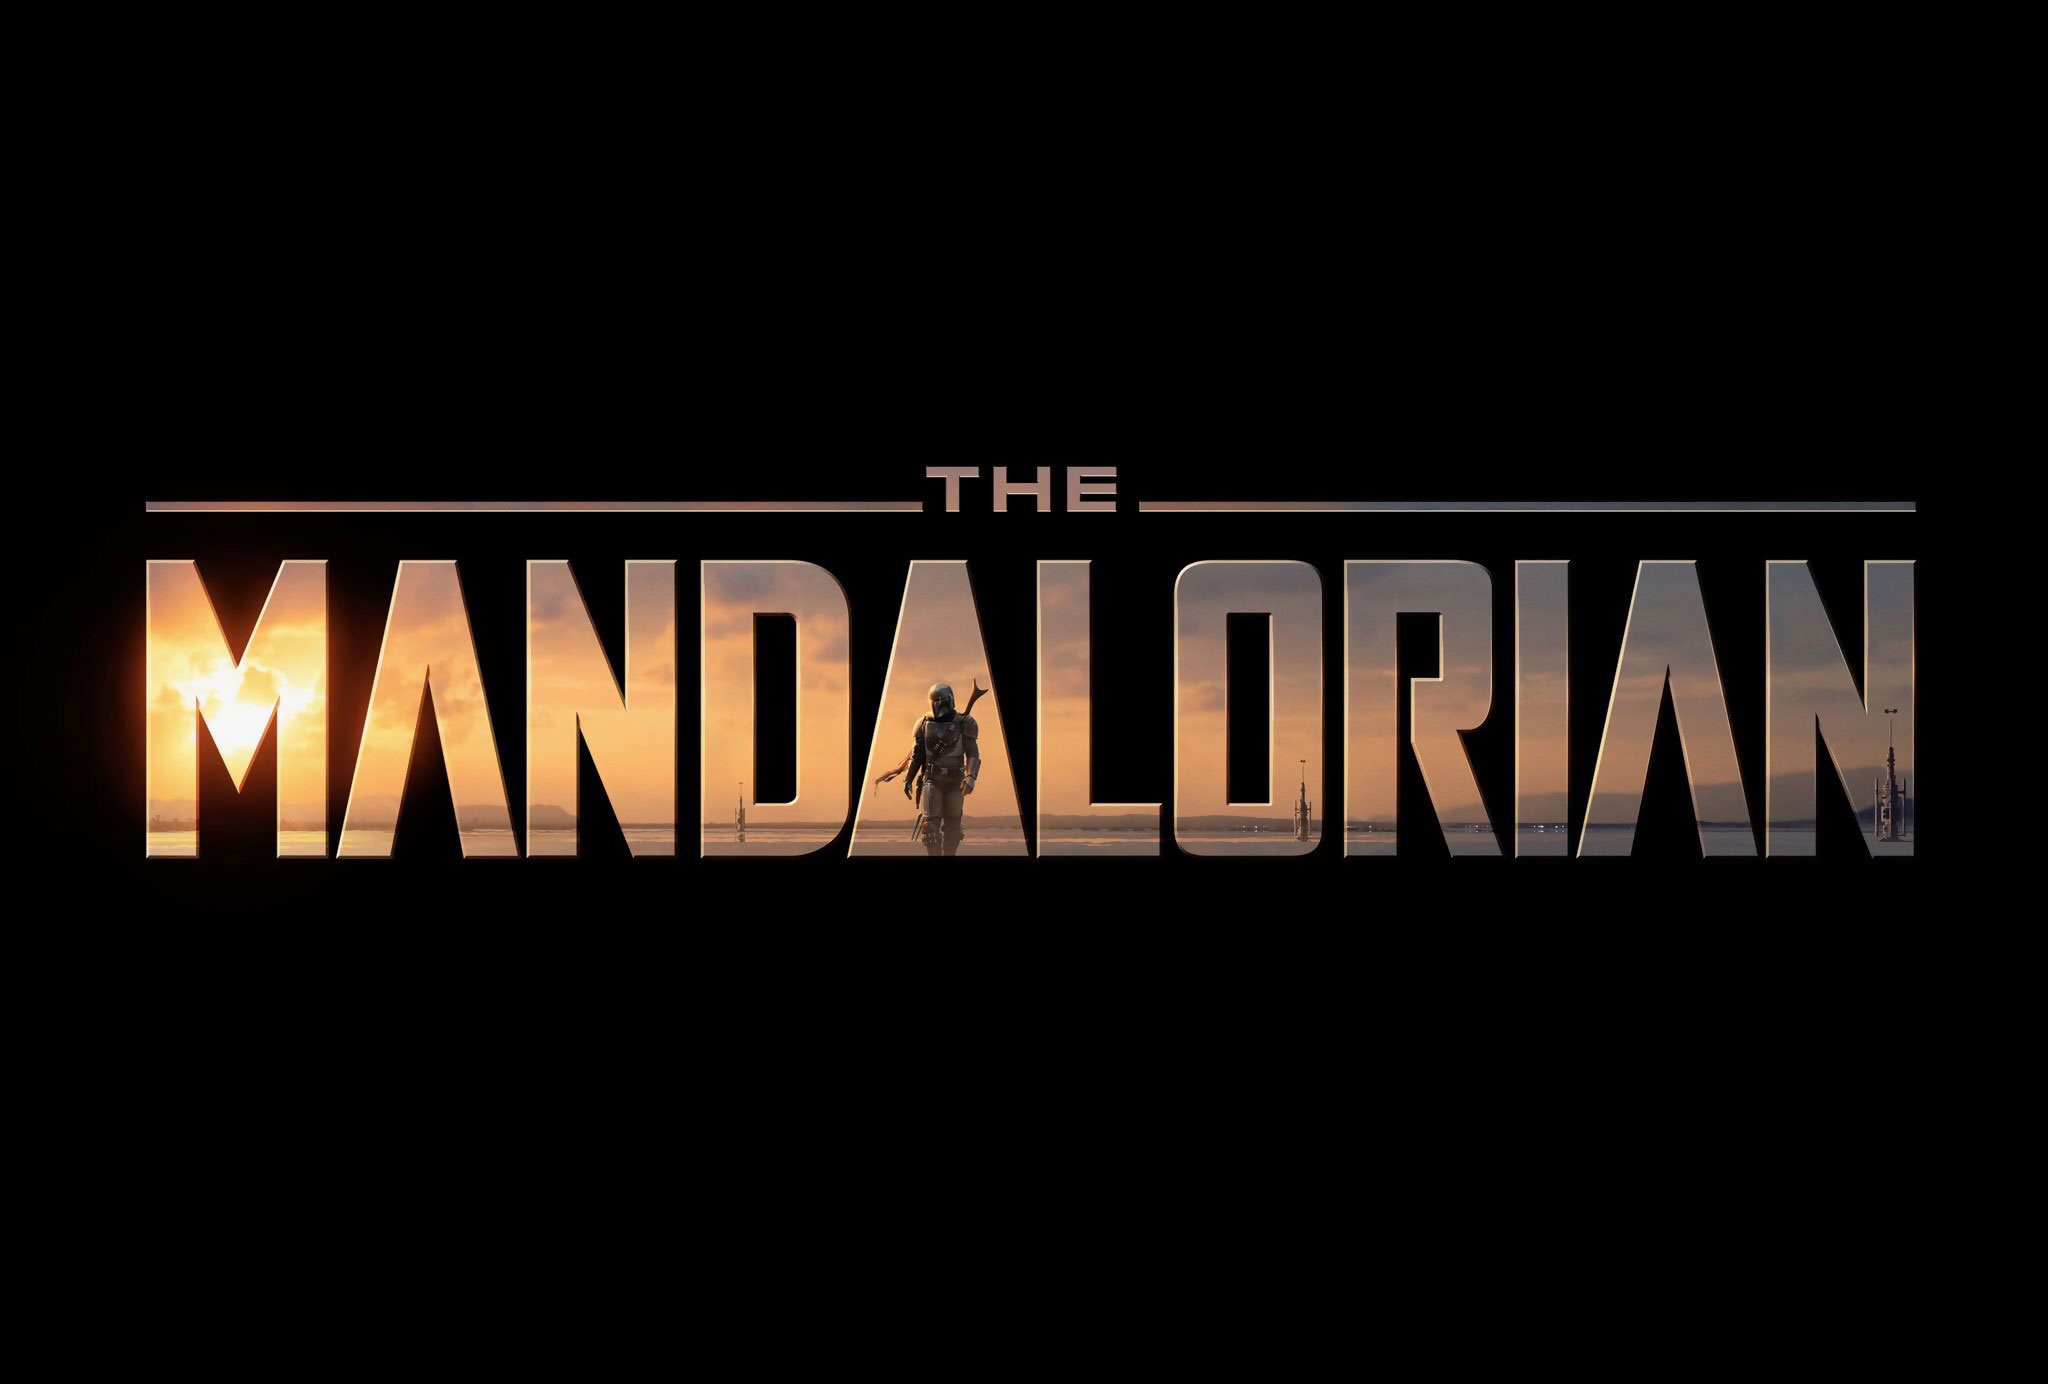 logo mandolorian star wars disney lucasfilm